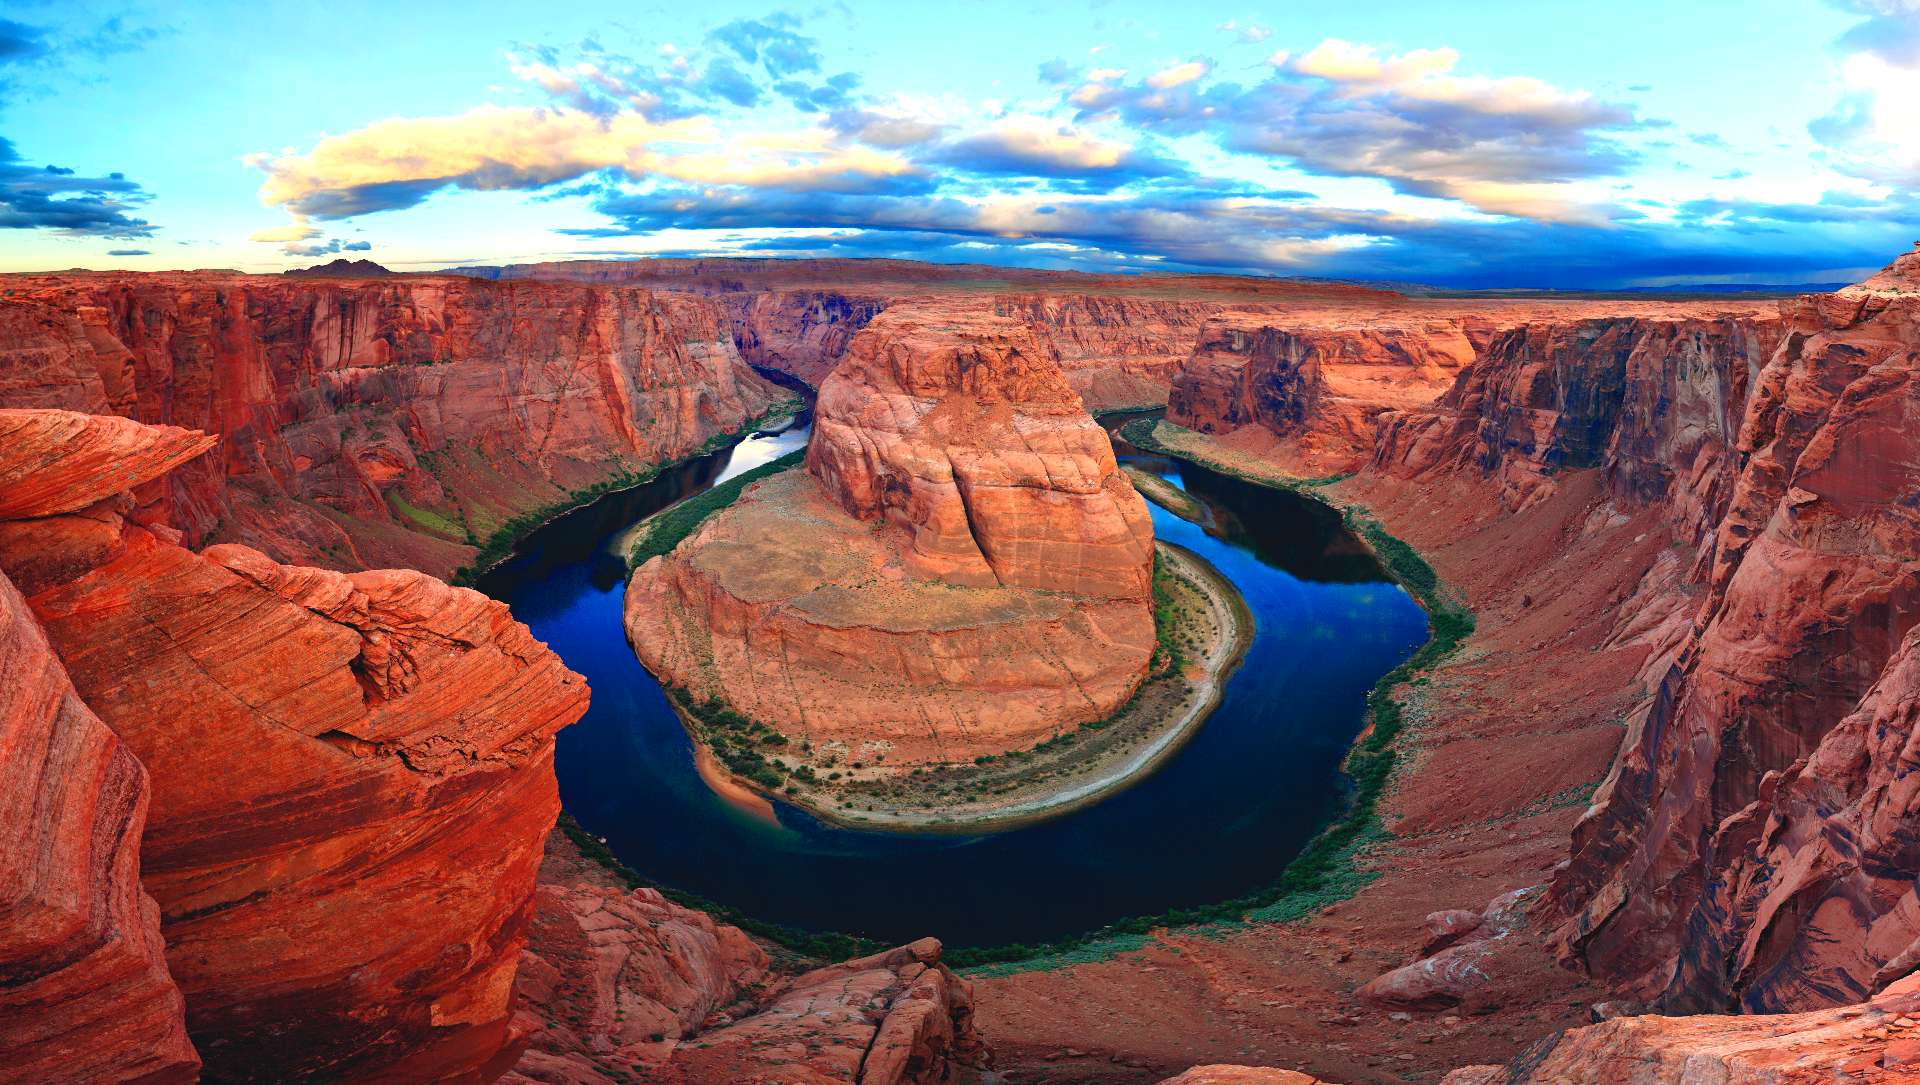 Arizona park _ Paul Auerbach#1